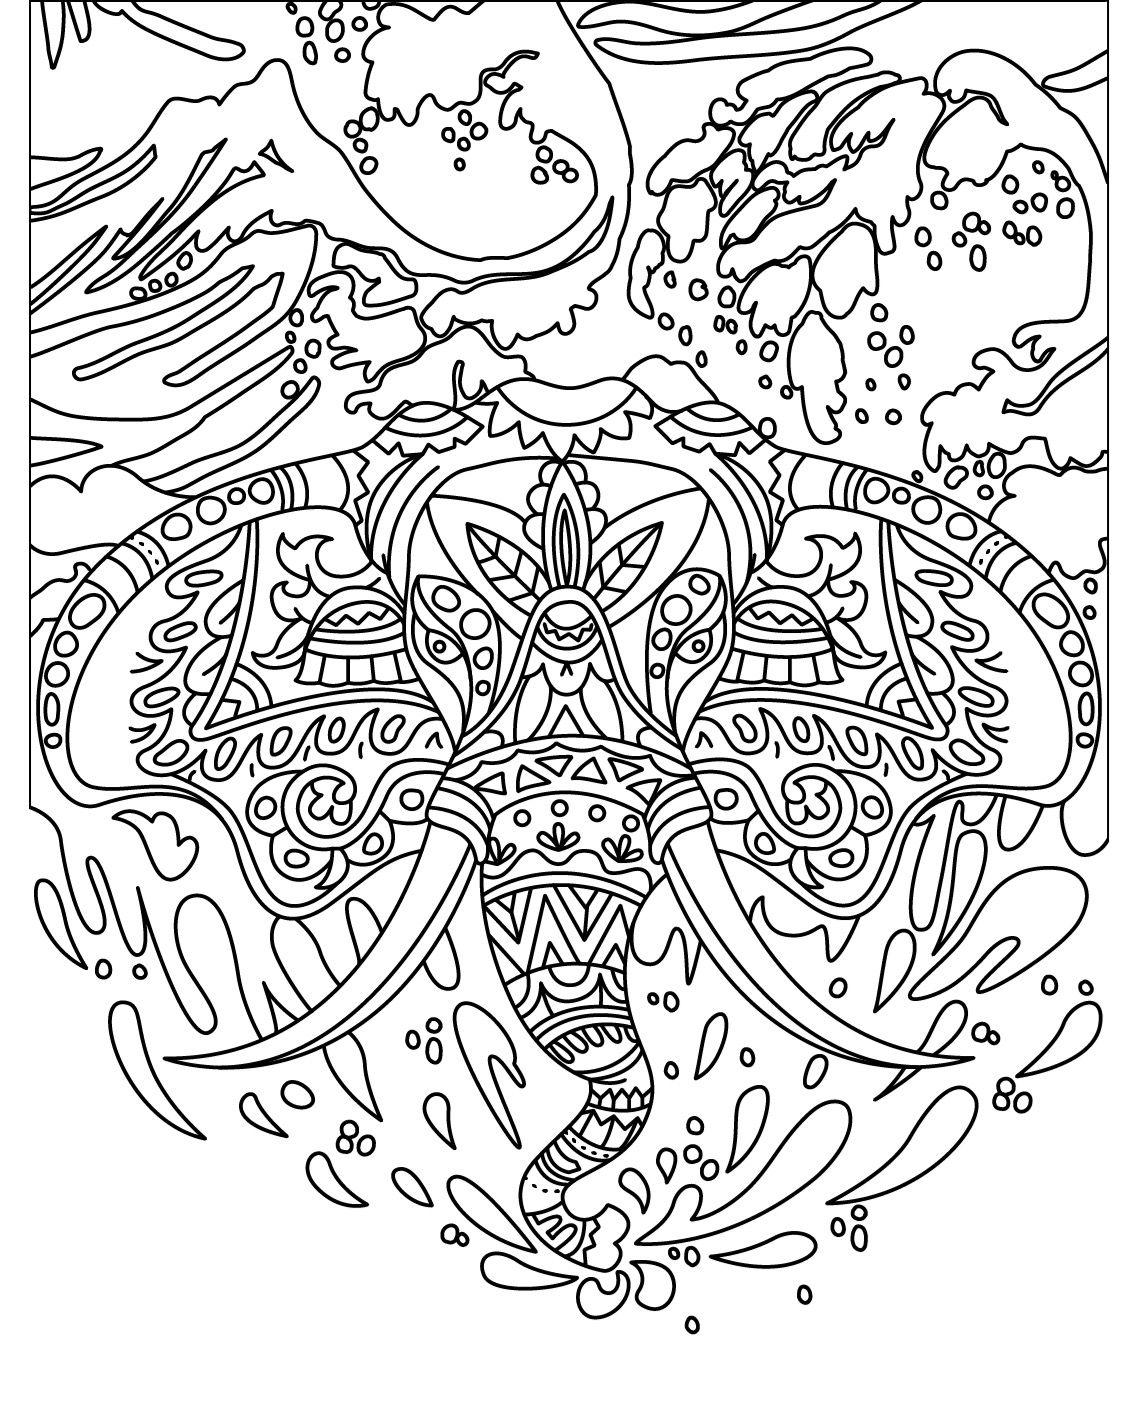 African Elephant | Colorish: coloring book app for adults mandala ...